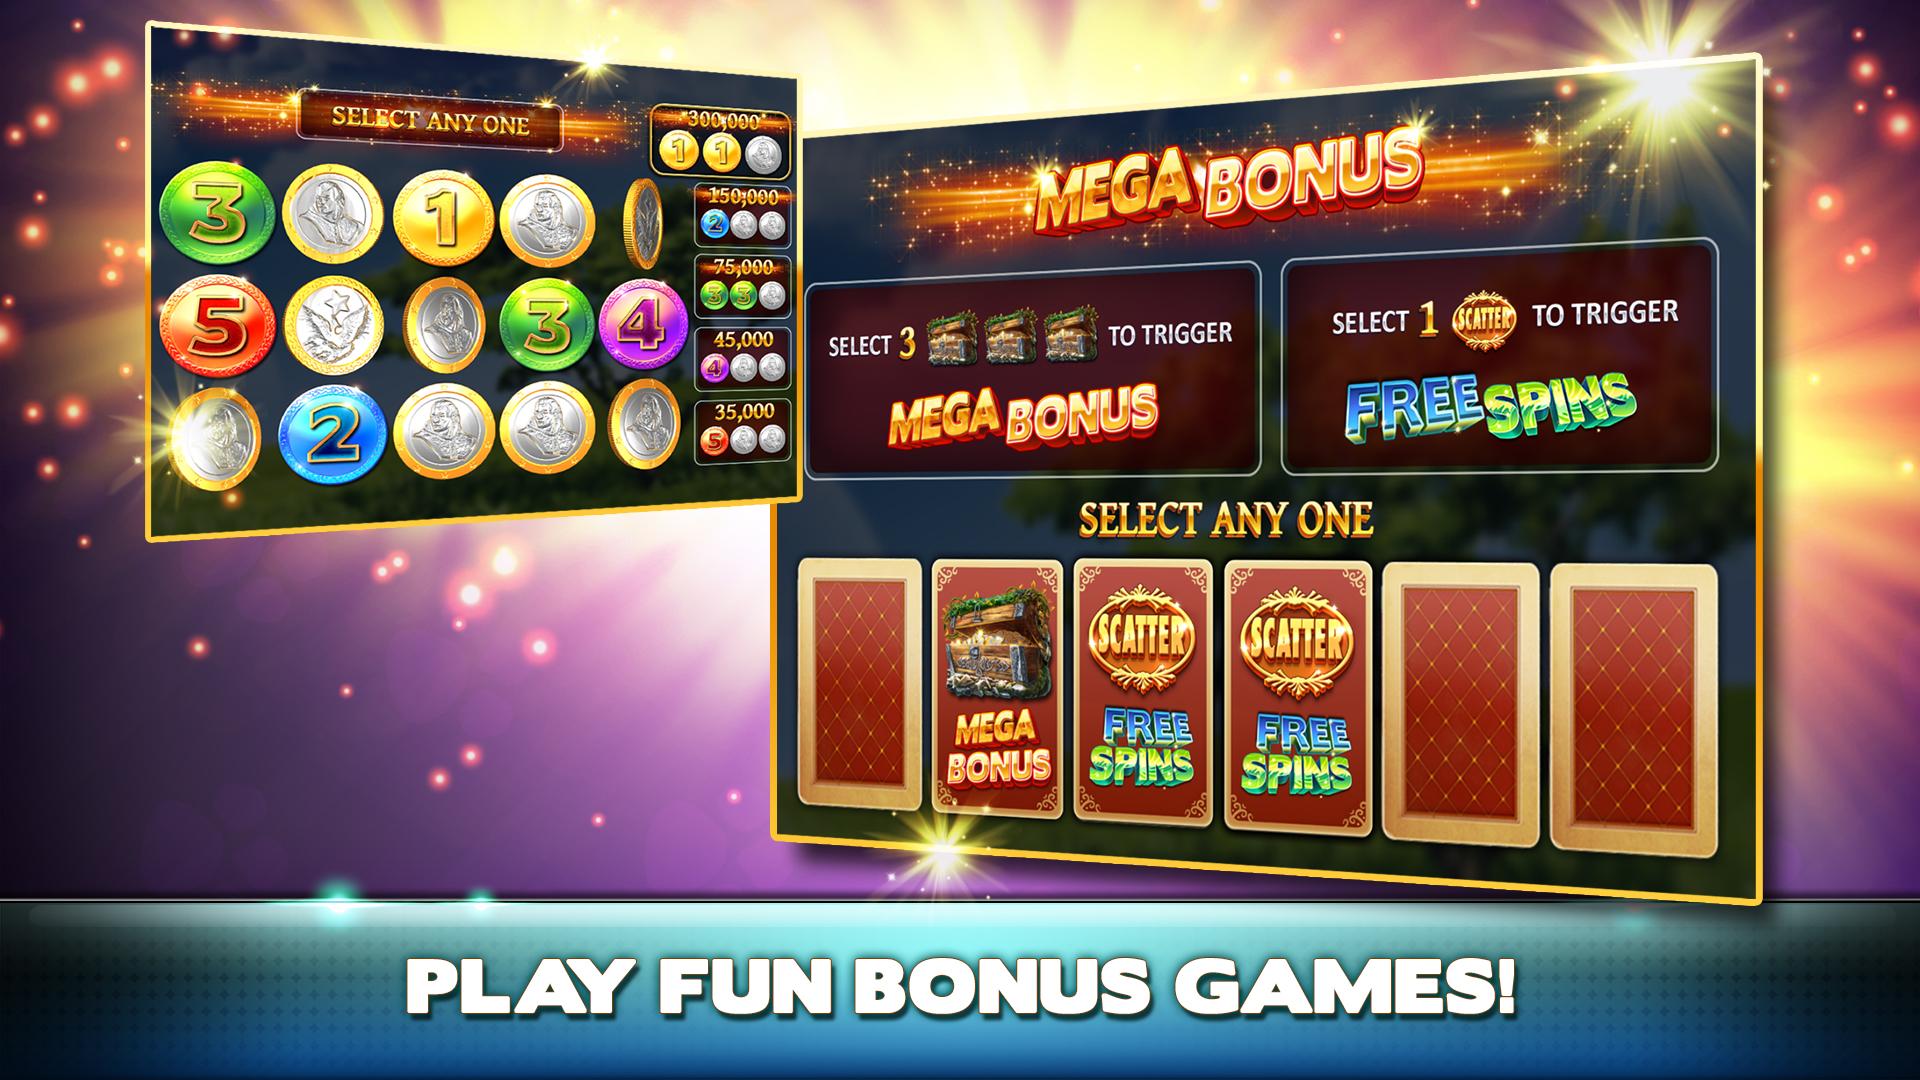 Chances of winning casino slots